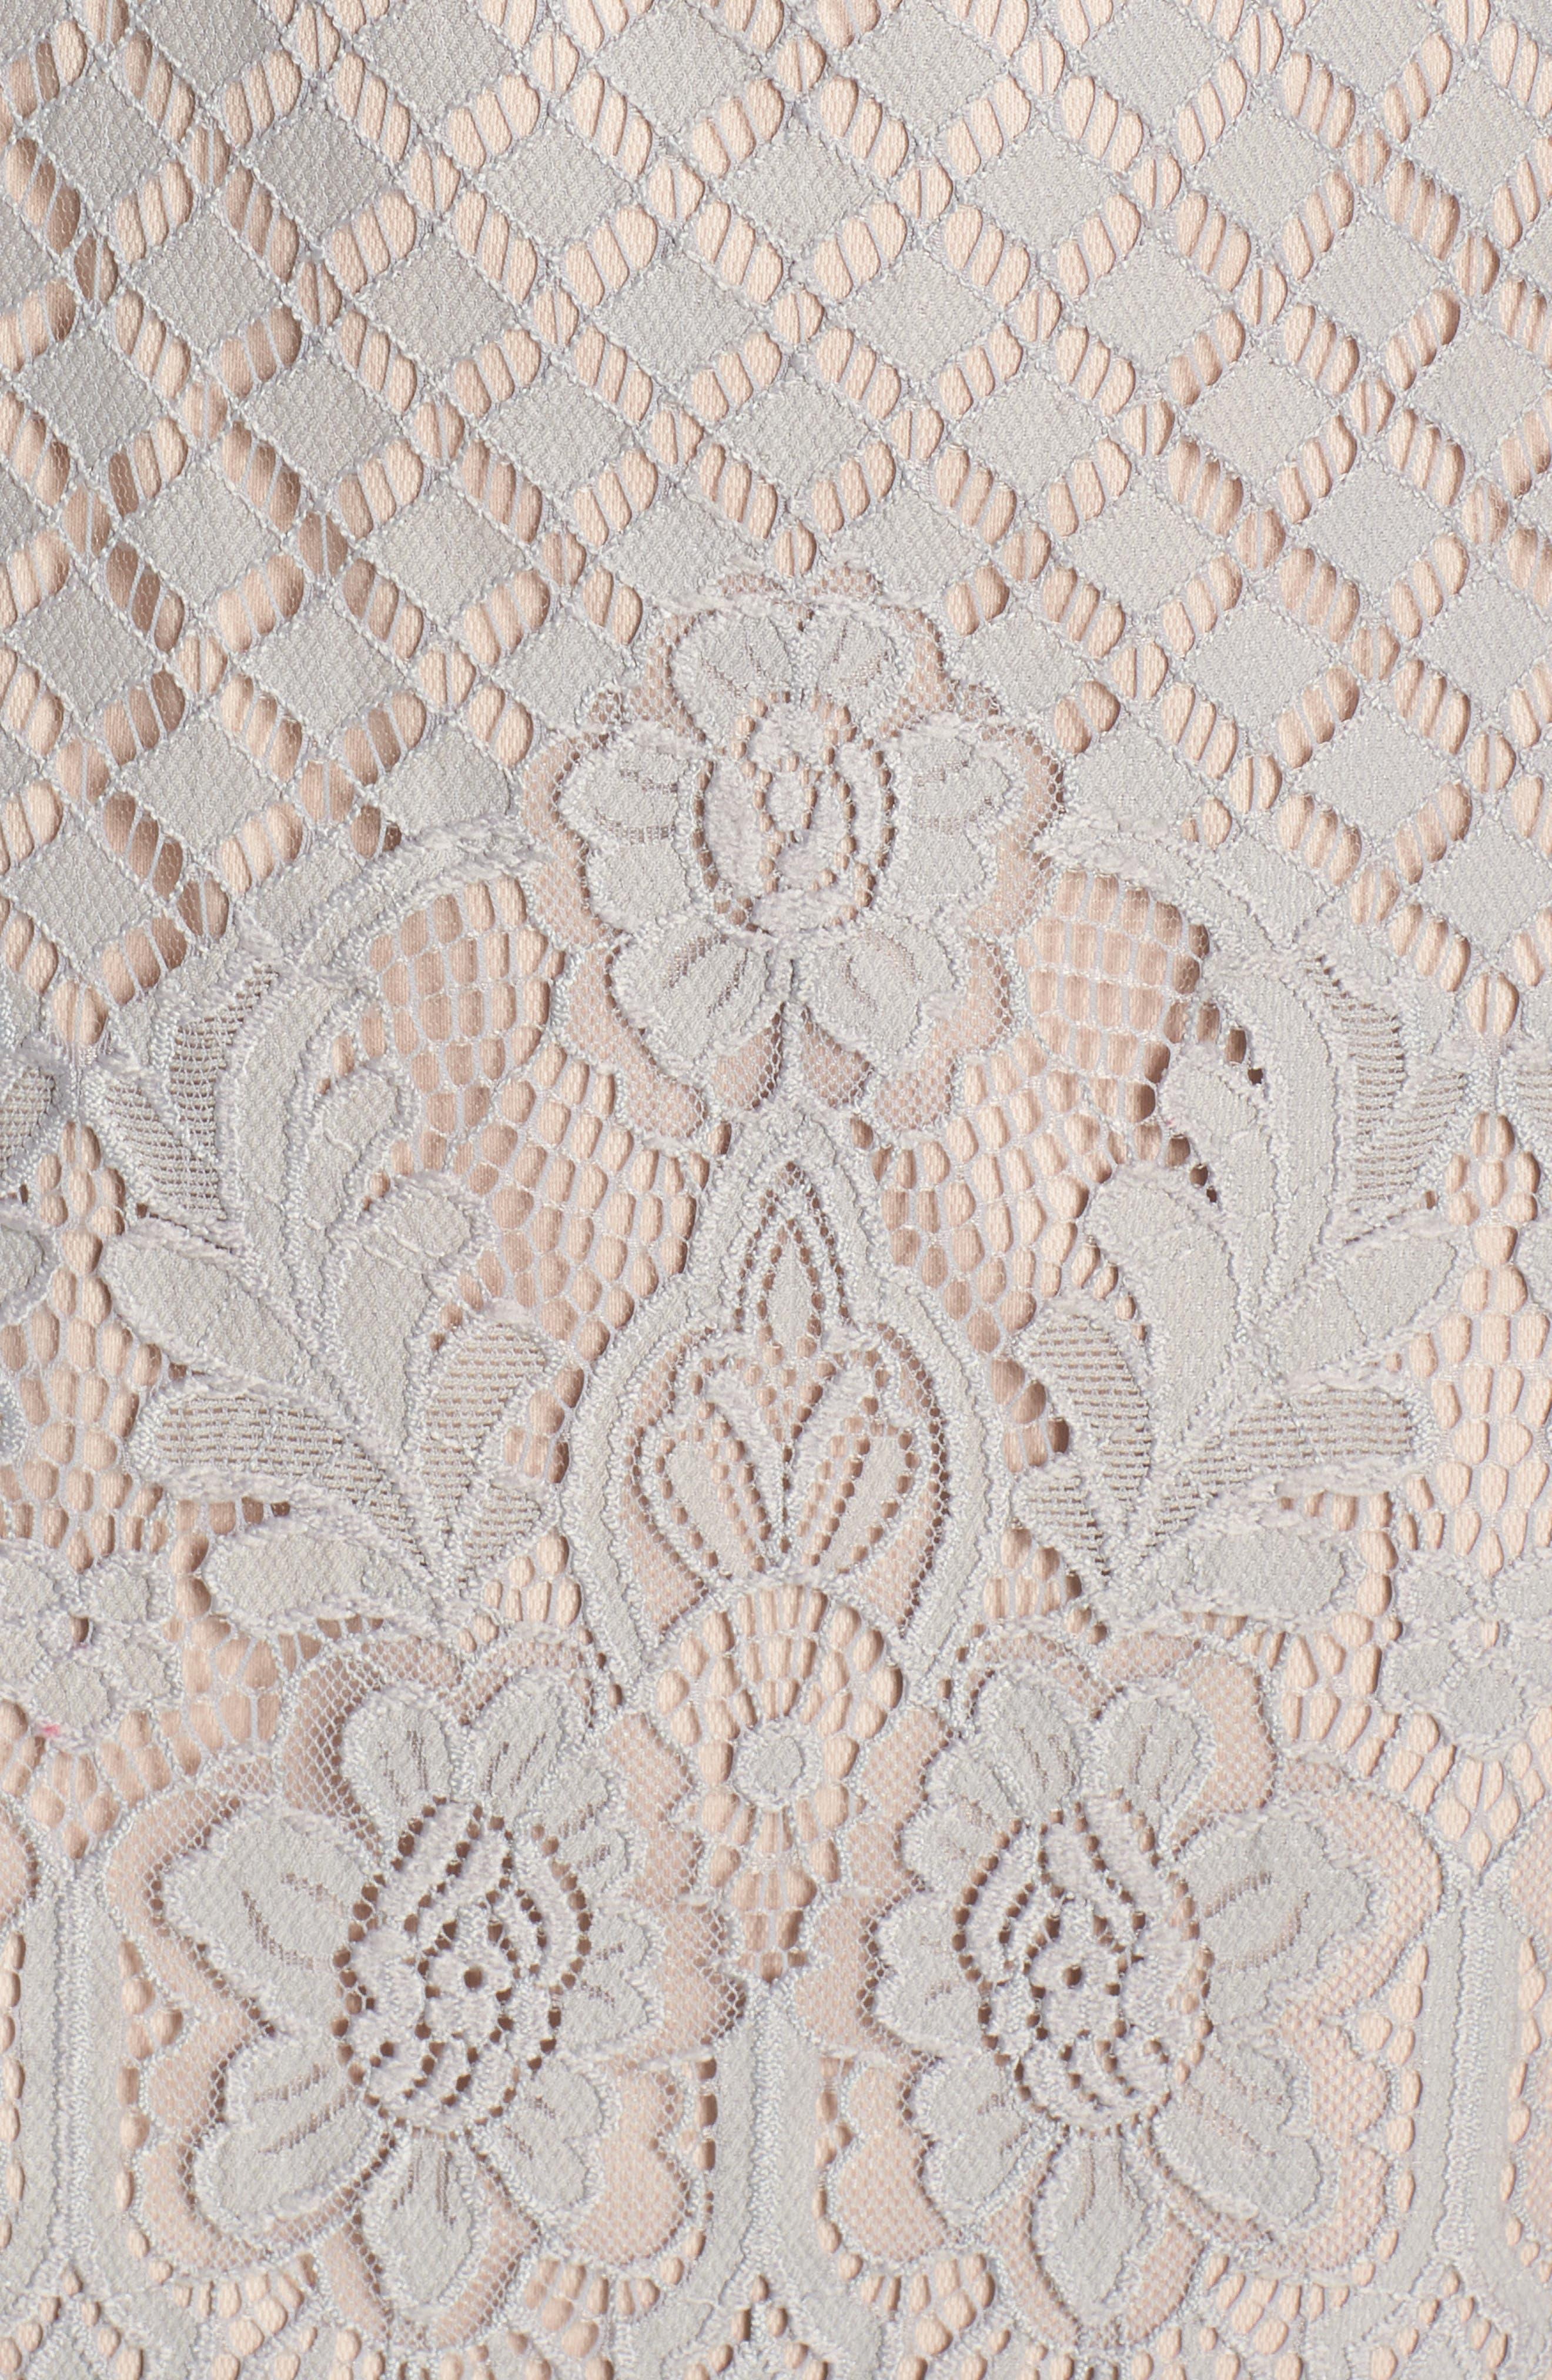 TADASHI SHOJI, Tie Sleeve Lace Sheath Dress, Alternate thumbnail 6, color, PEWTER/ PETAL